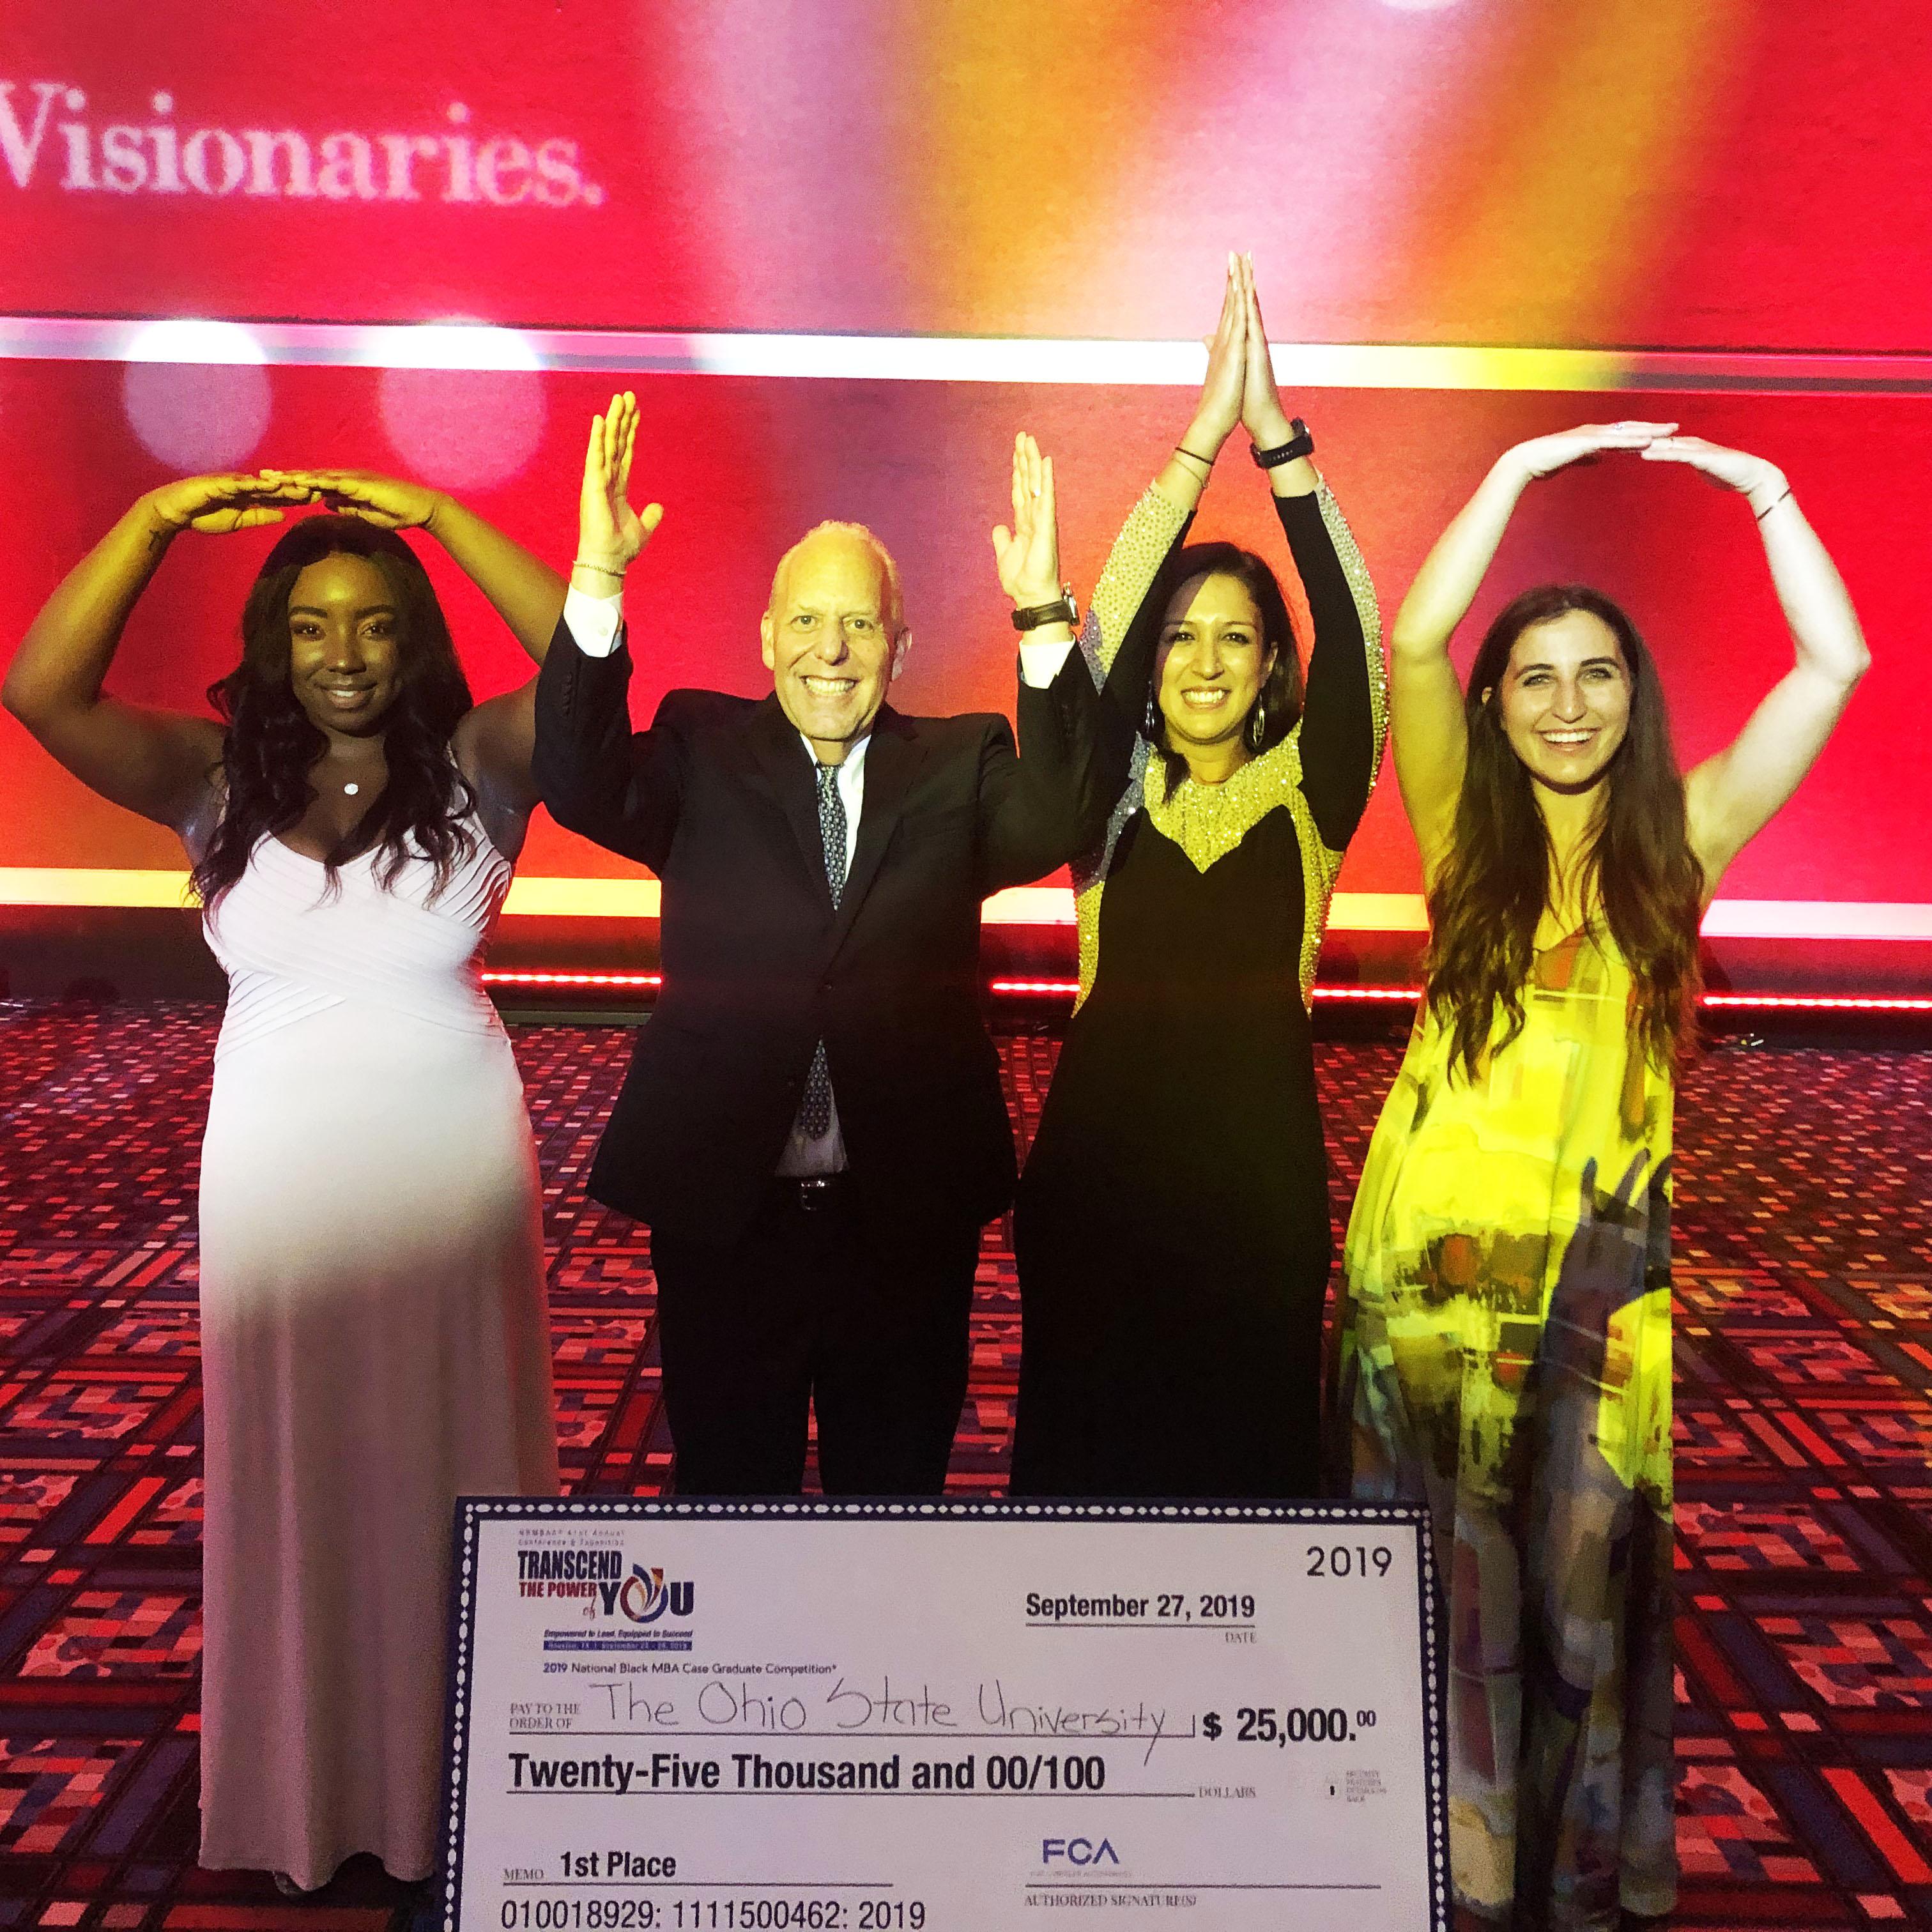 The winning MBA team shows their Buckeye spirit with O-H-I-O